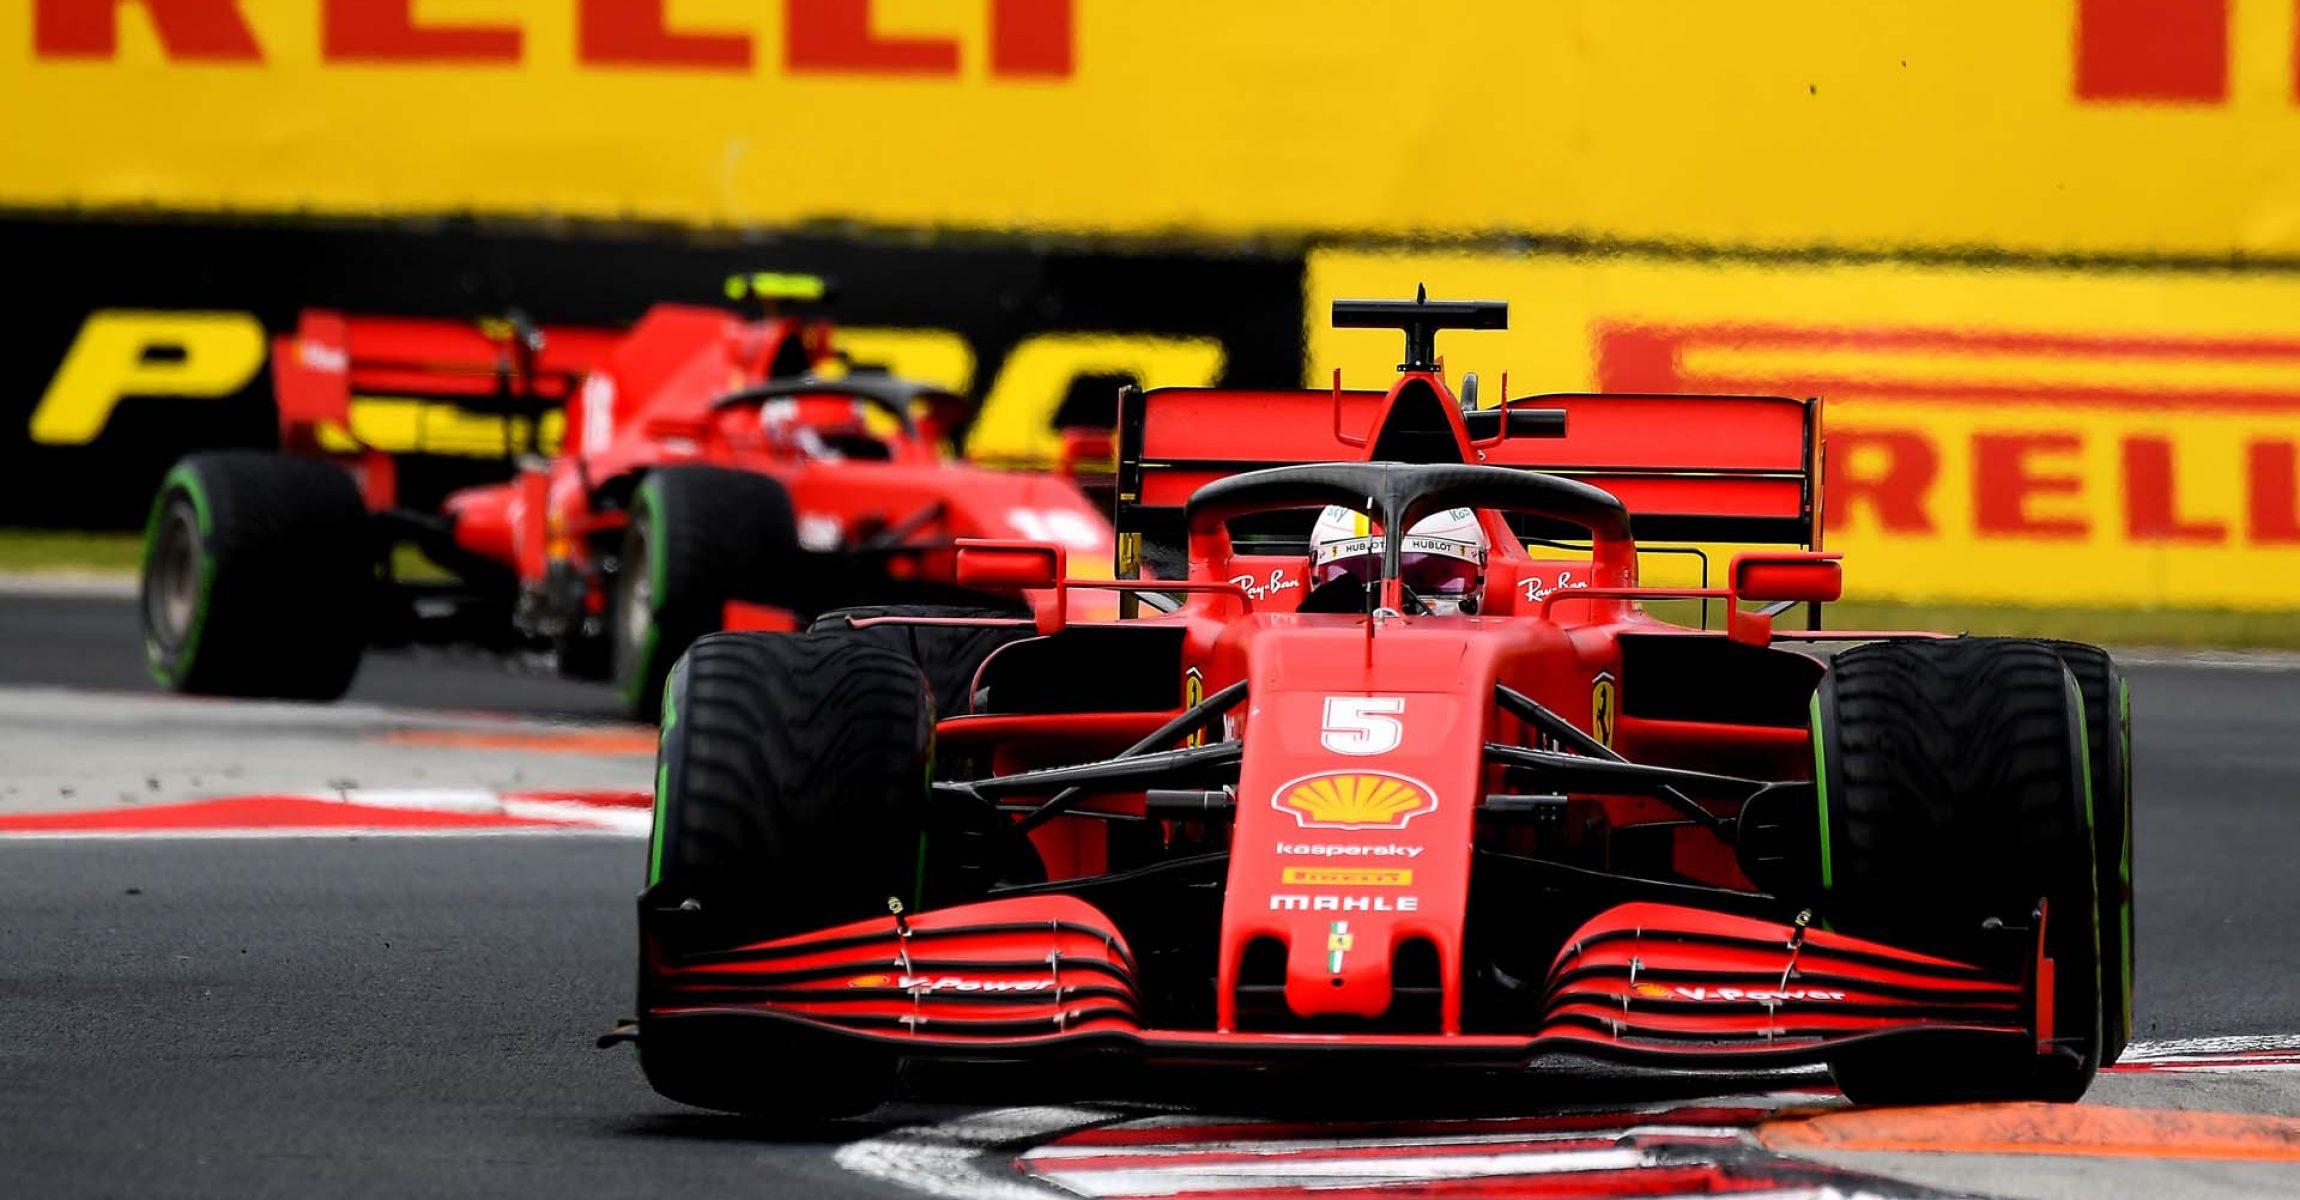 GP UNGHERIA  F1/2020 -  DOMENICA 19/07/2020  credit: @Scuderia Ferrari Press Office Sebastian Vettel followed by Charles Leclerc